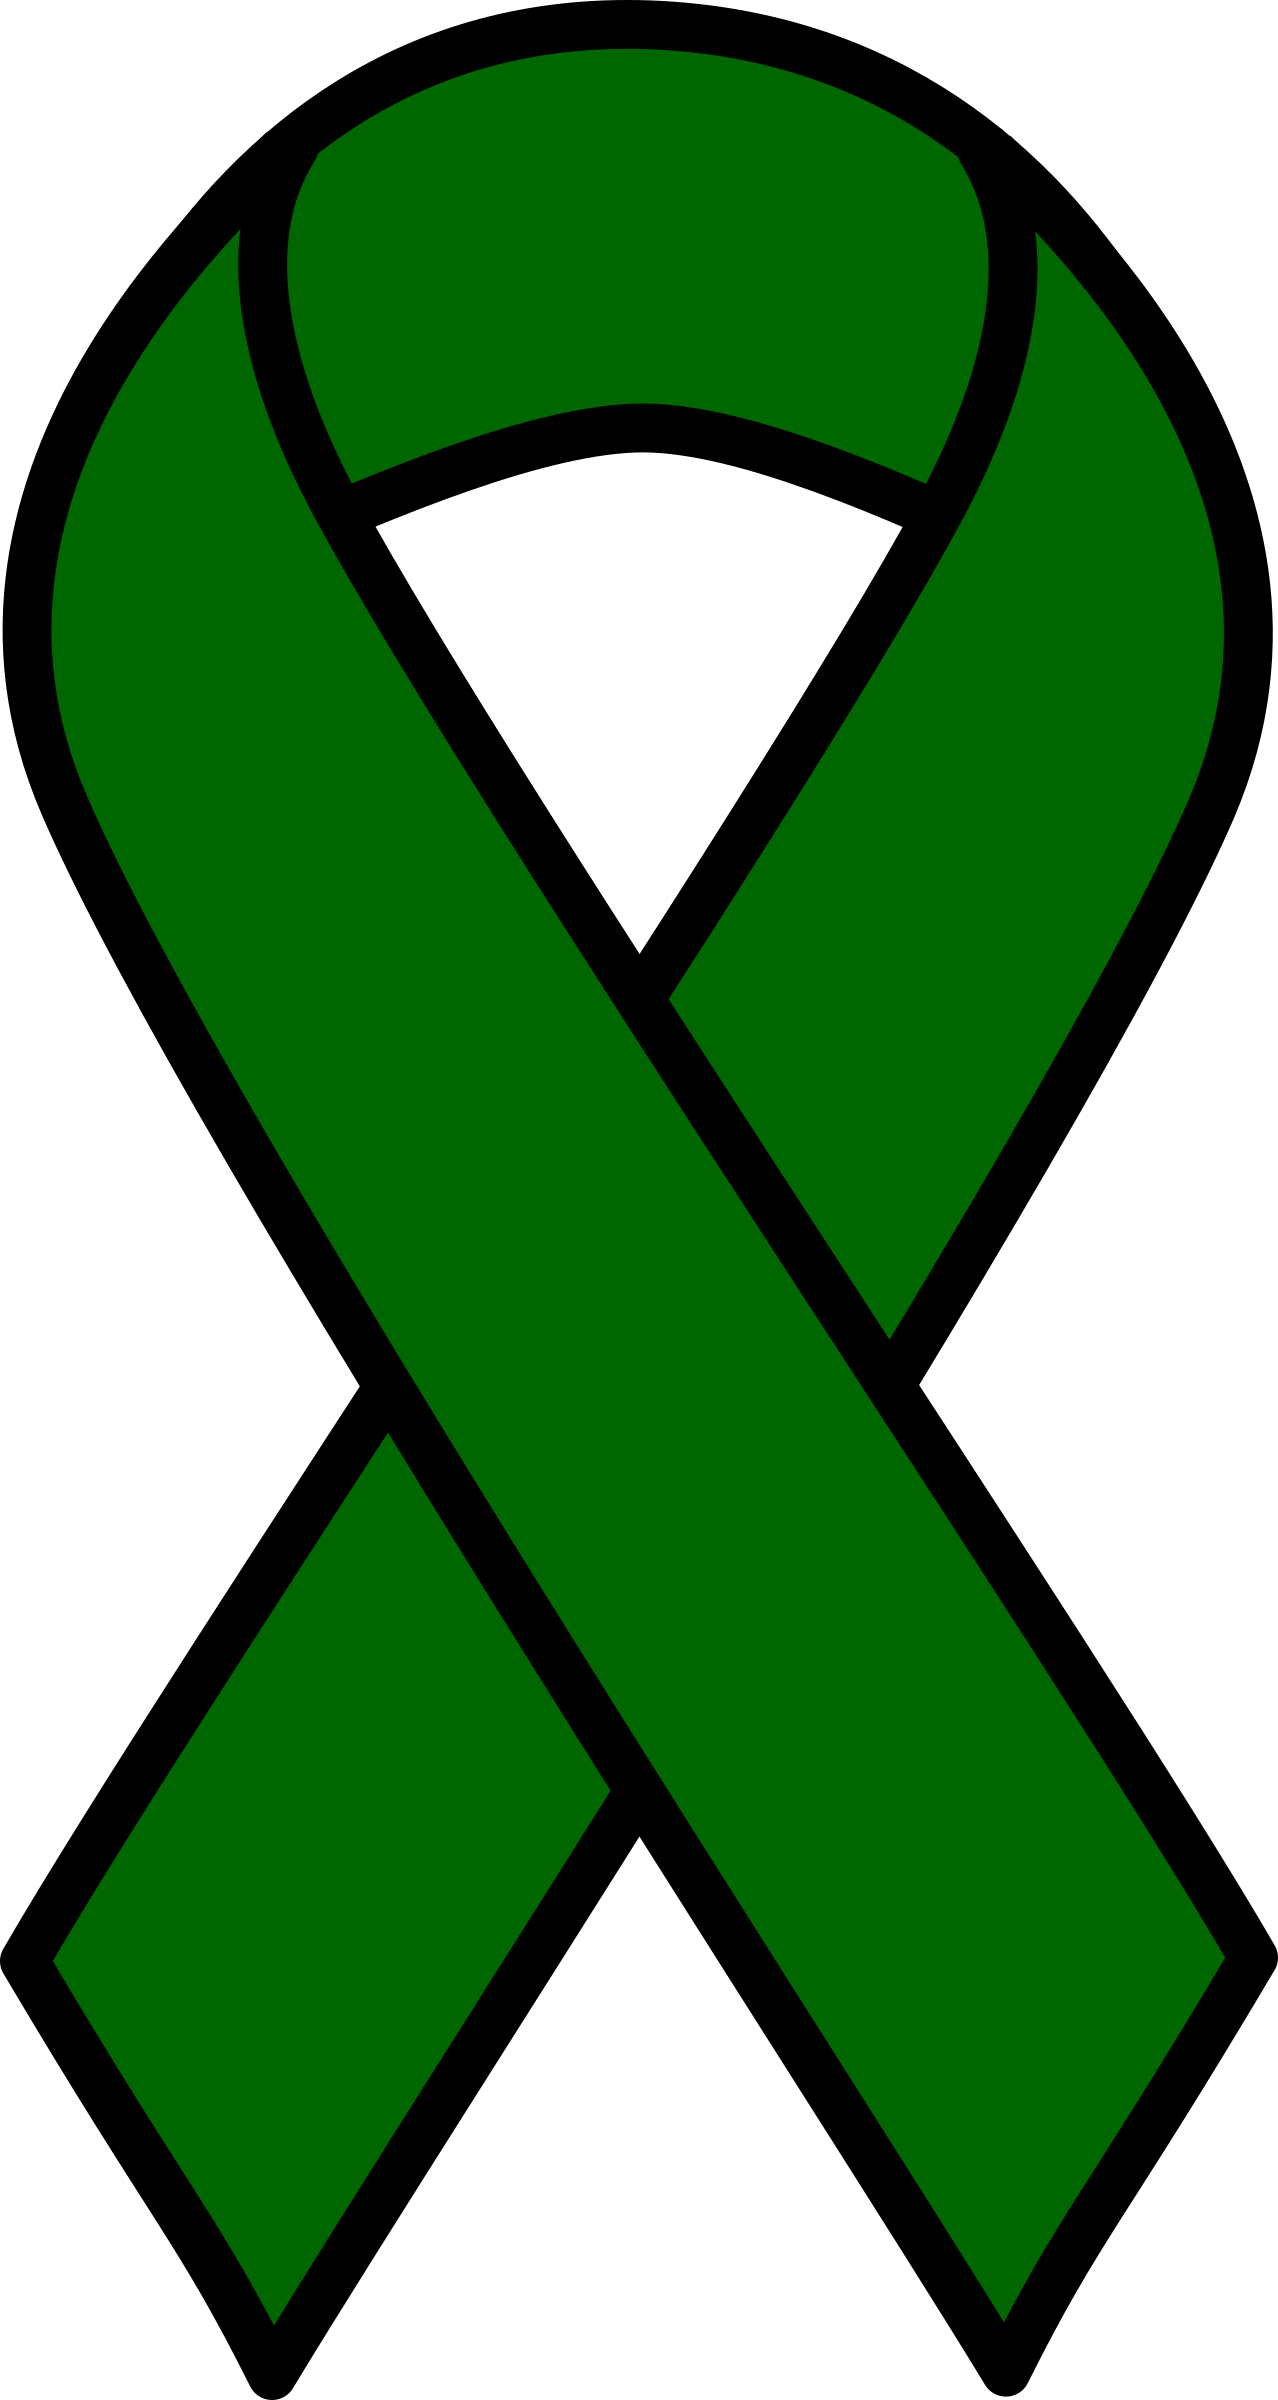 Emerald clipart transparent Clipart Liver emerald Cancer Green